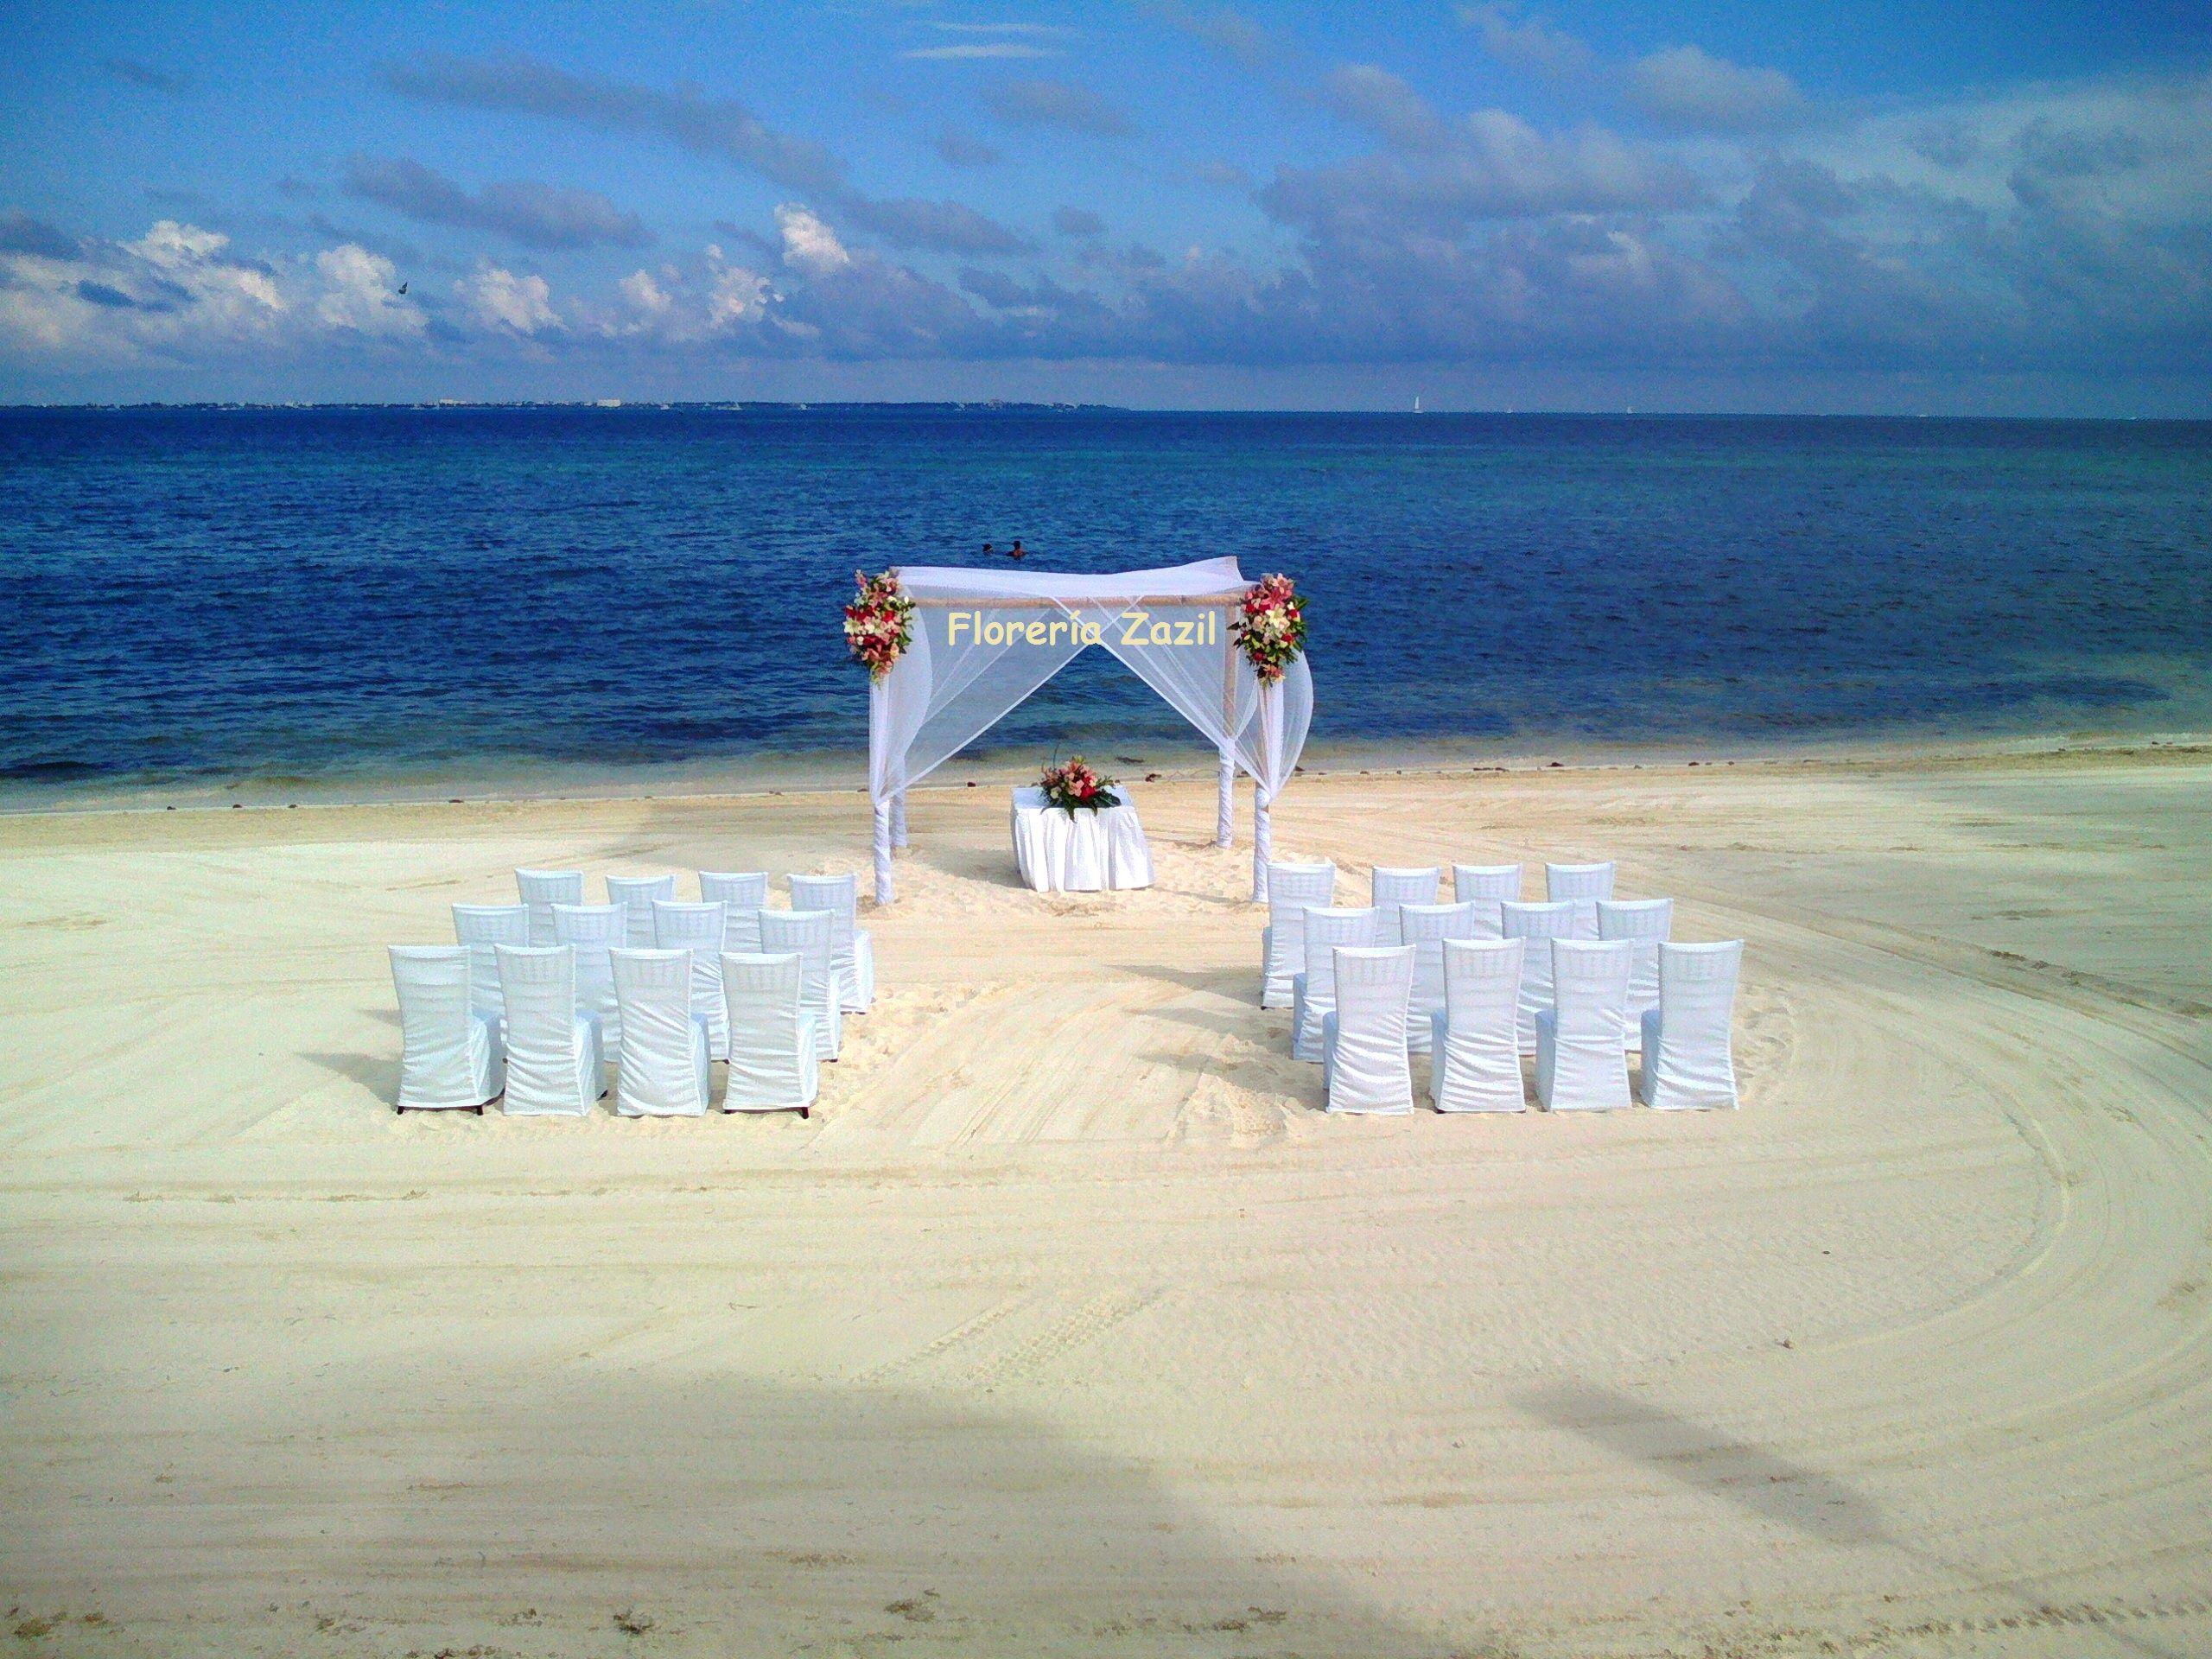 Gazebo decor #Cancunweddingflowers #Beachwedding #Rivieramayawedding #floreriazazil